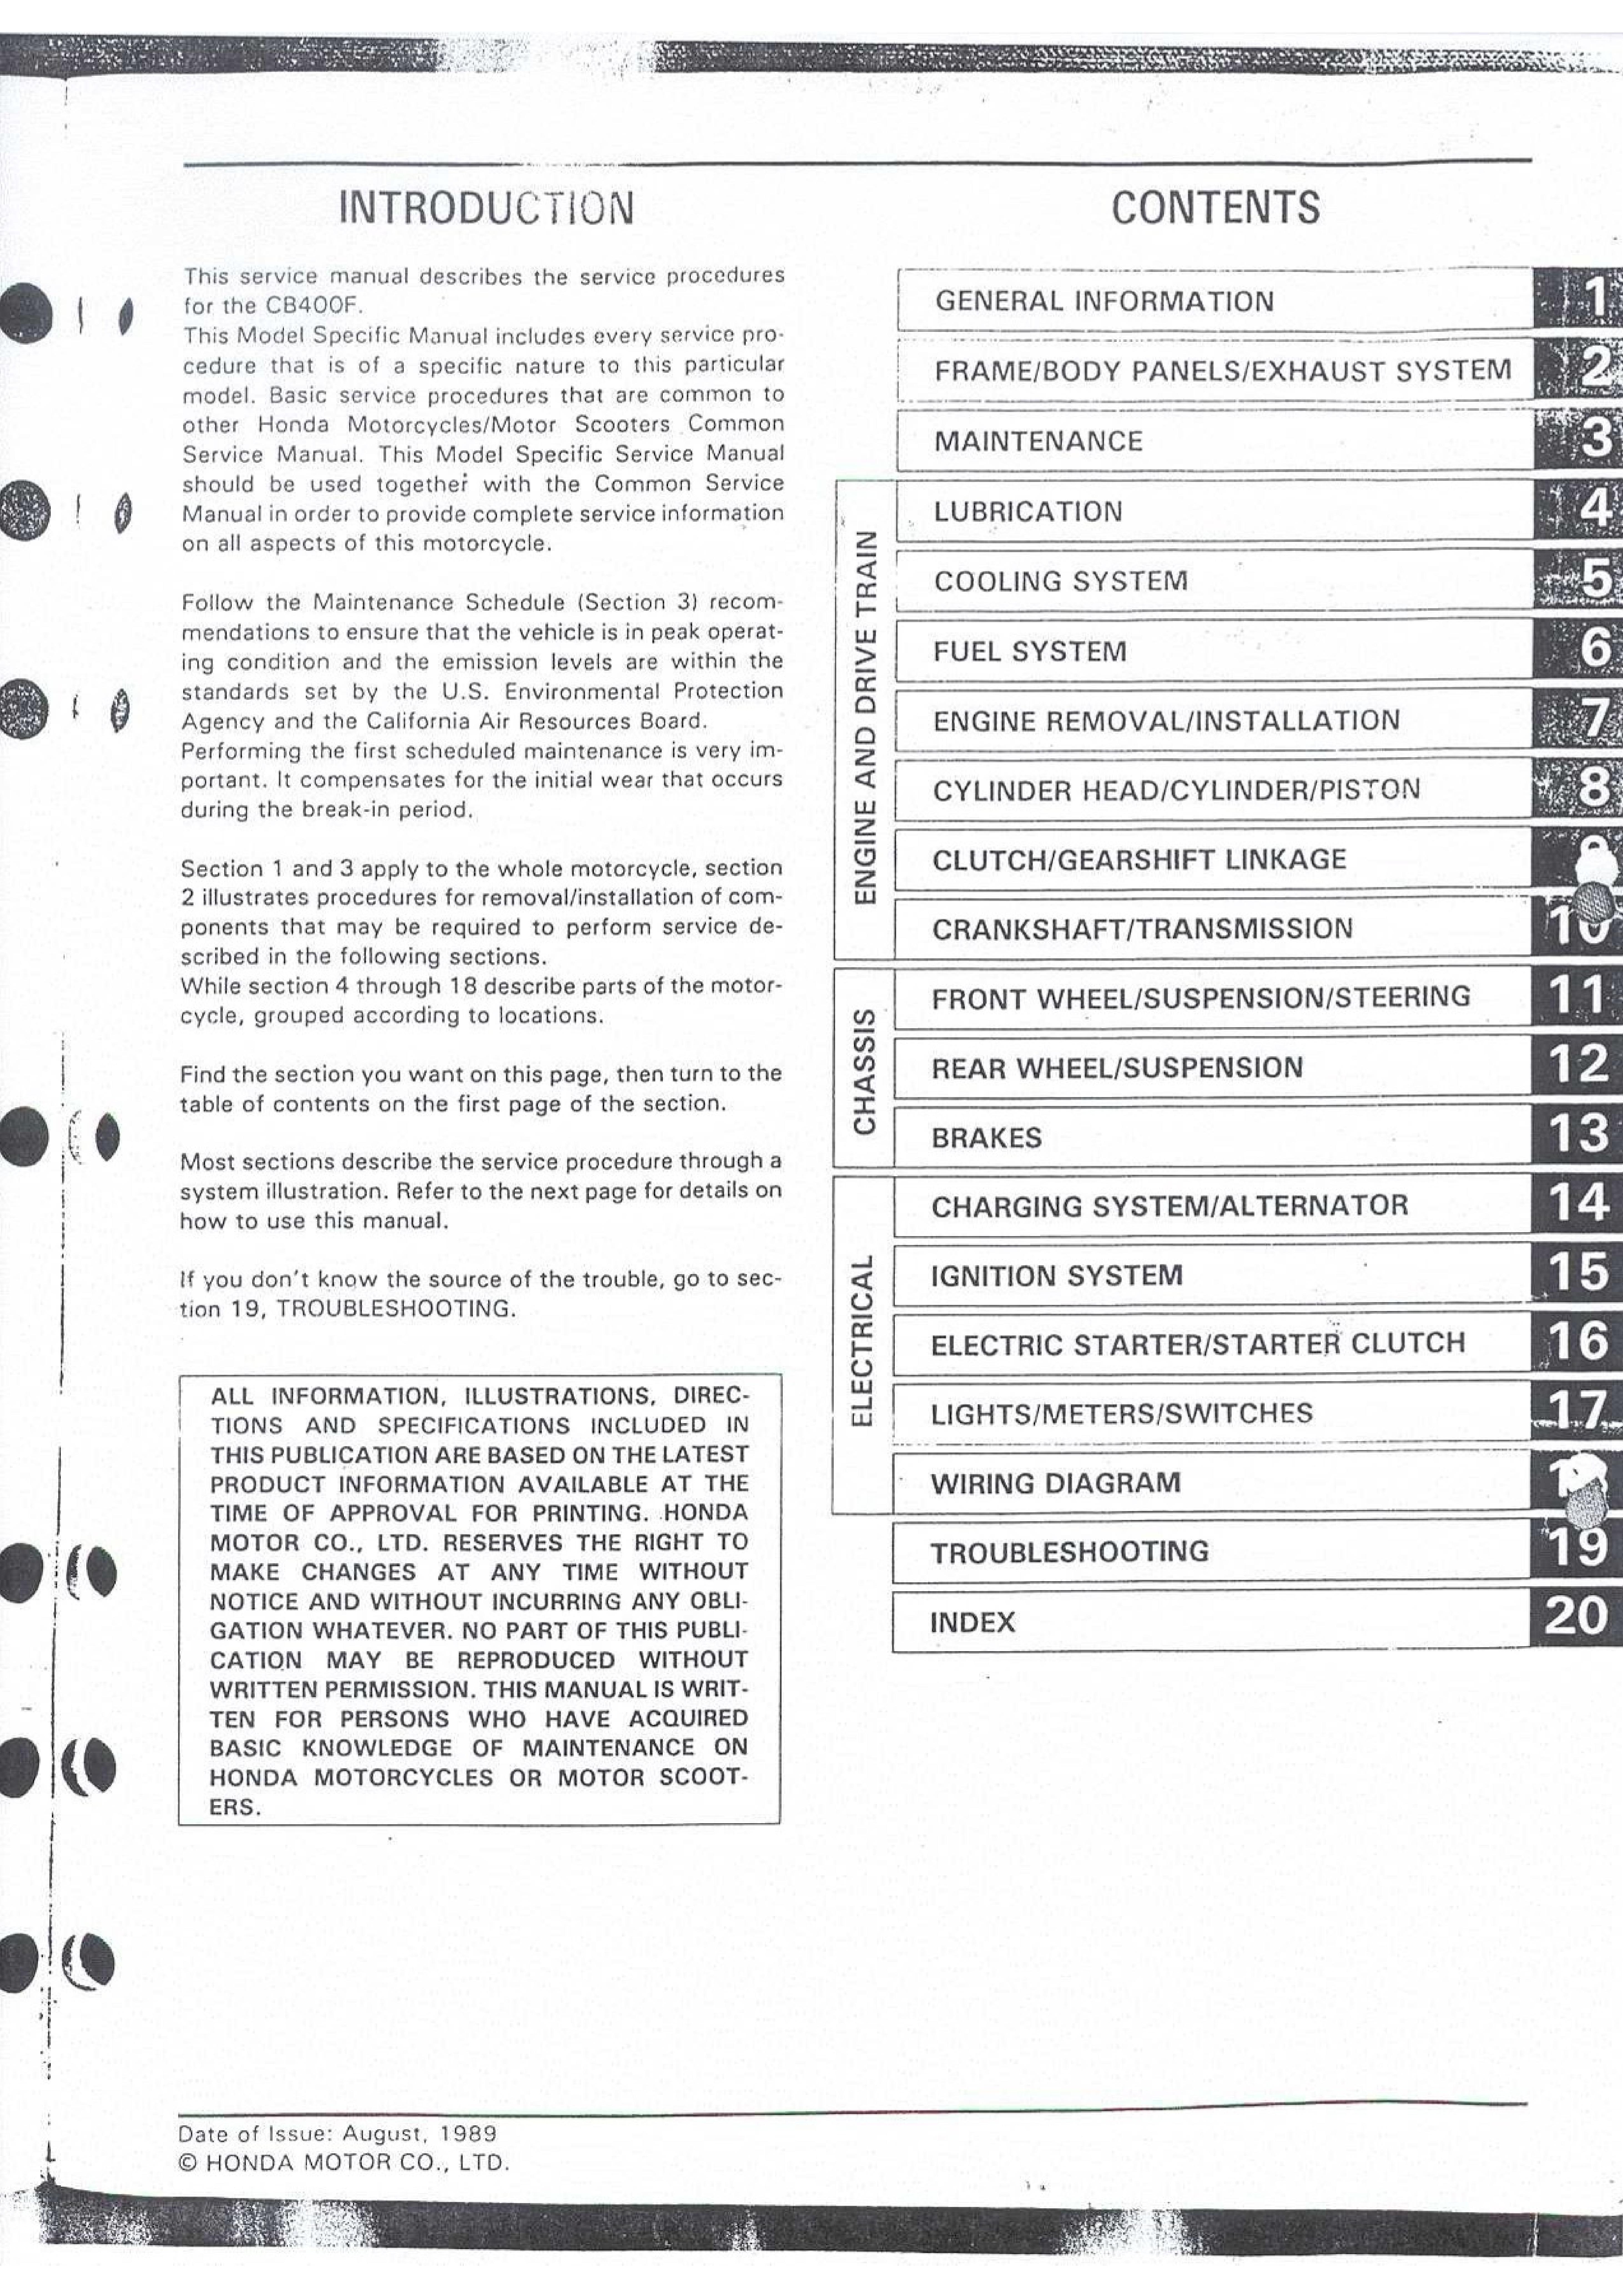 Workshop Manual for Honda CB400F / CB1 (august 1989)